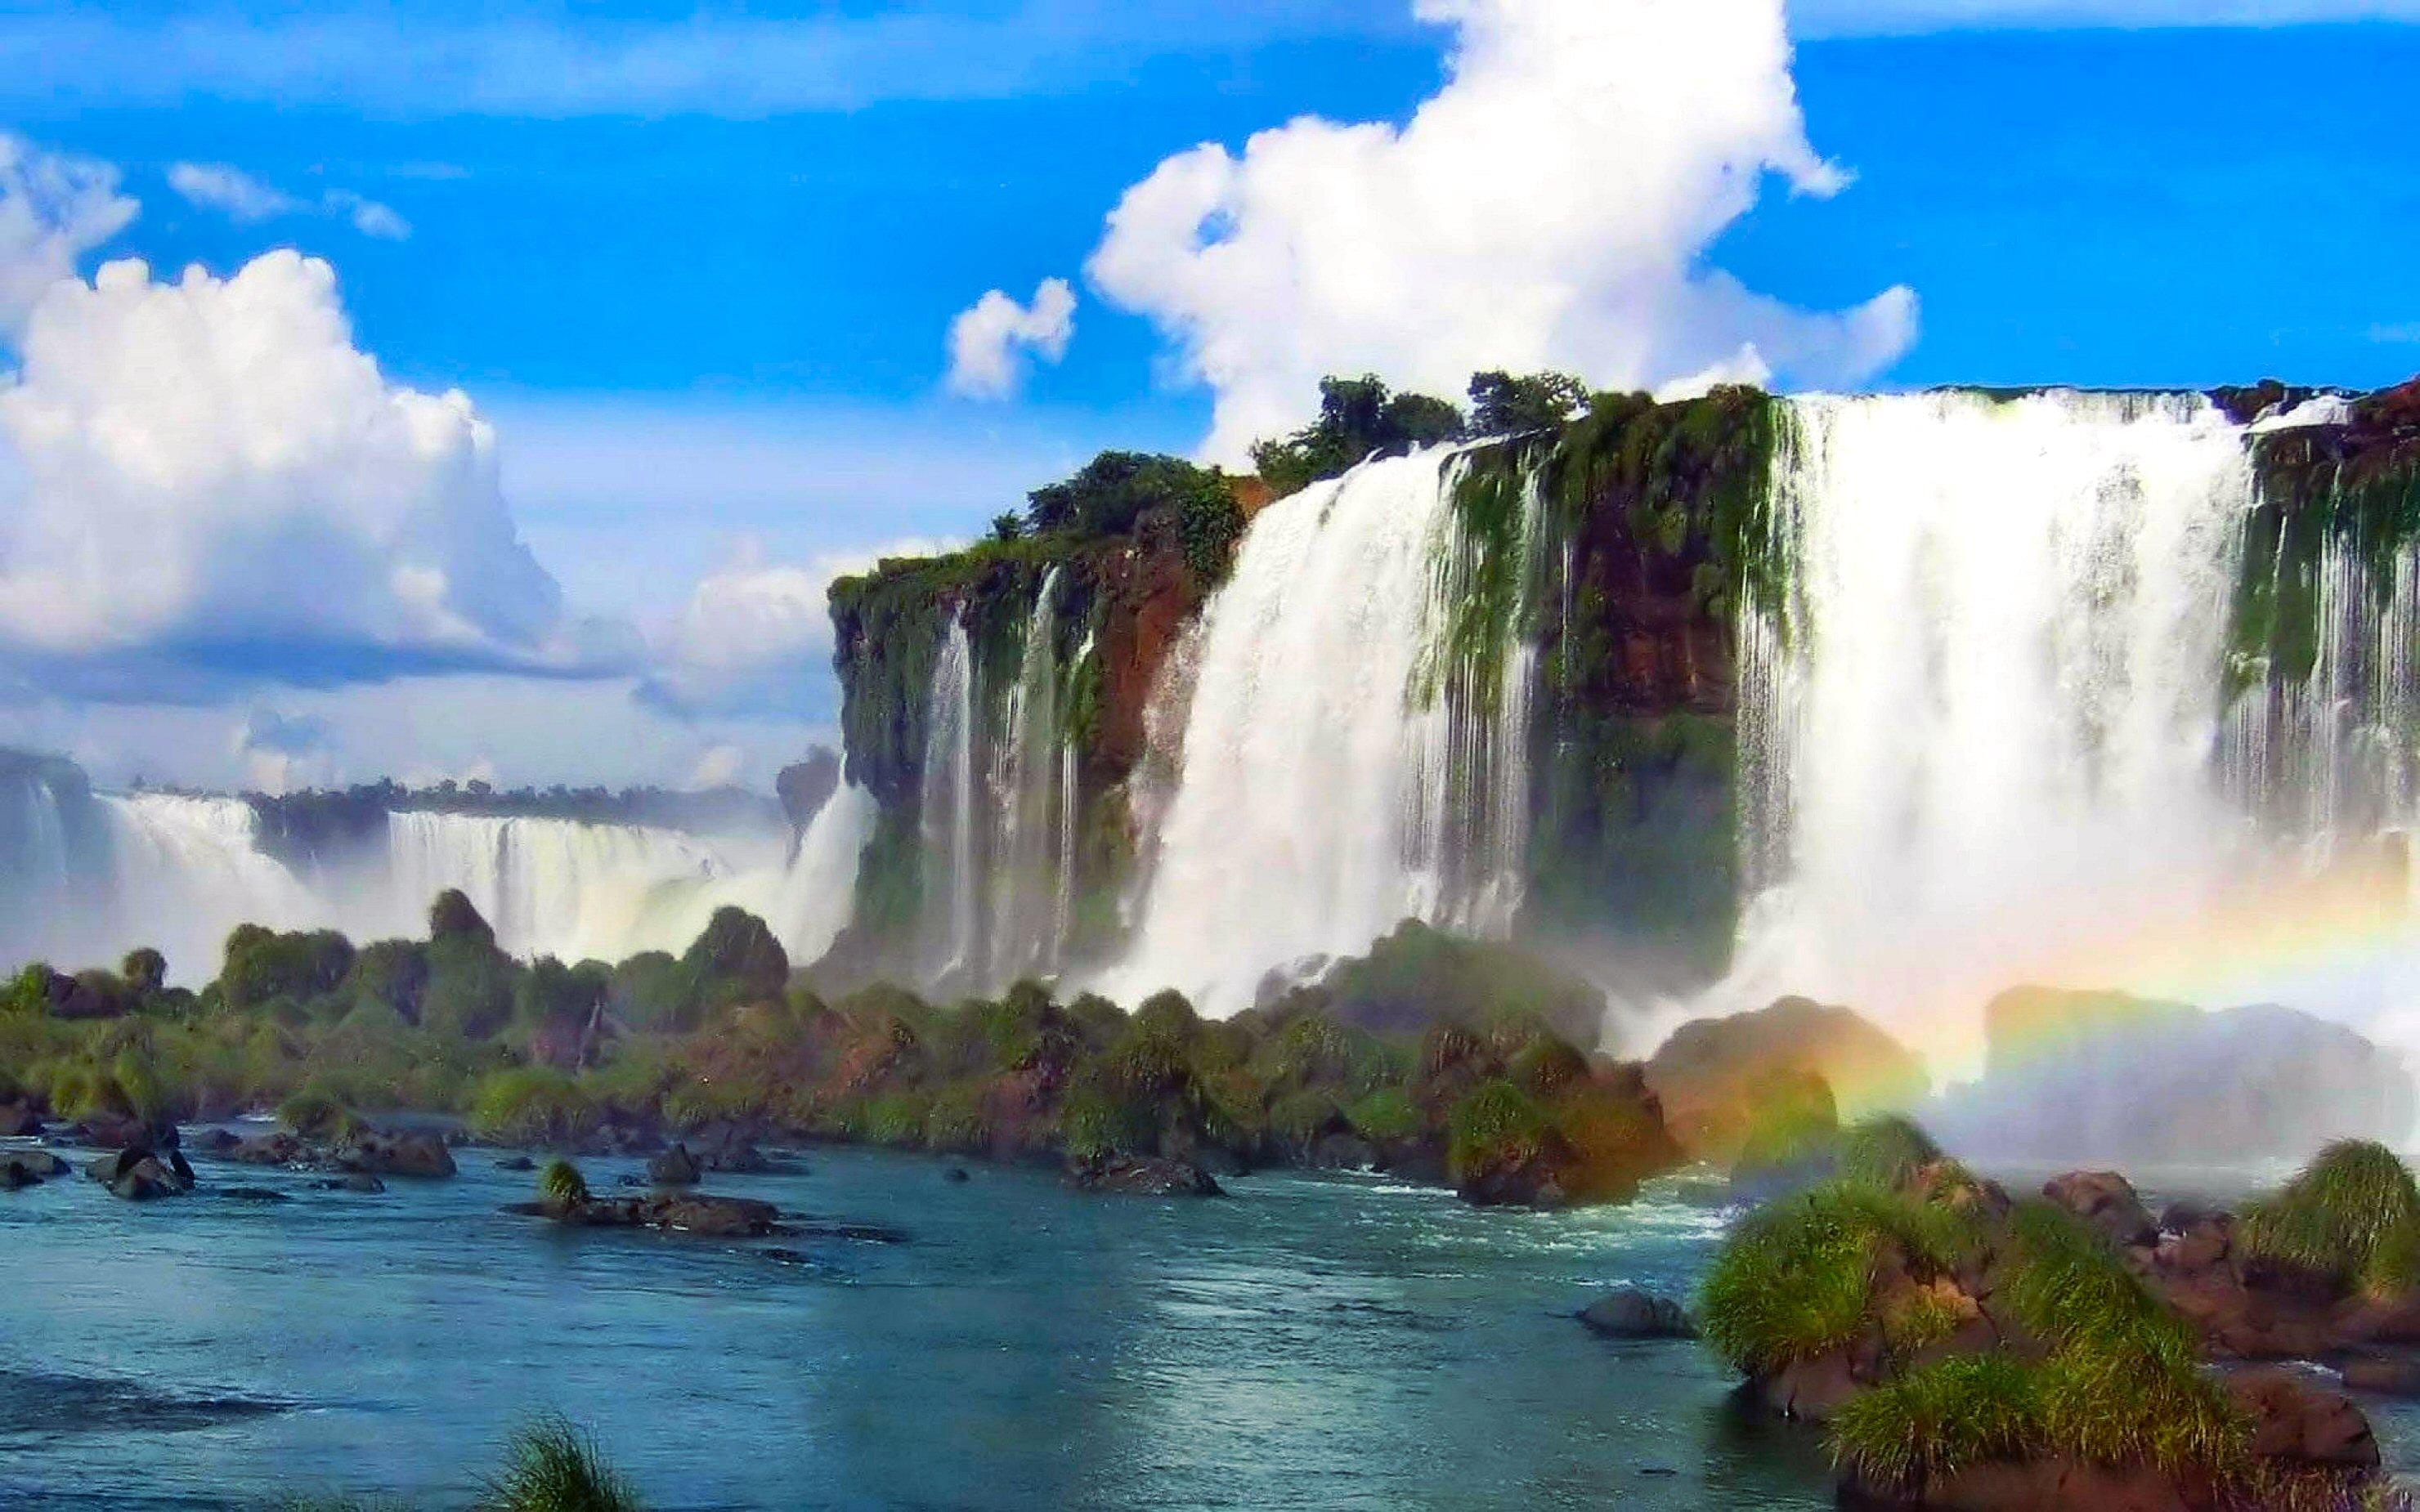 Niagara Falls Hd 1080p Wallpapers Waterfall Wallpaper High Quality Pixelstalk Net